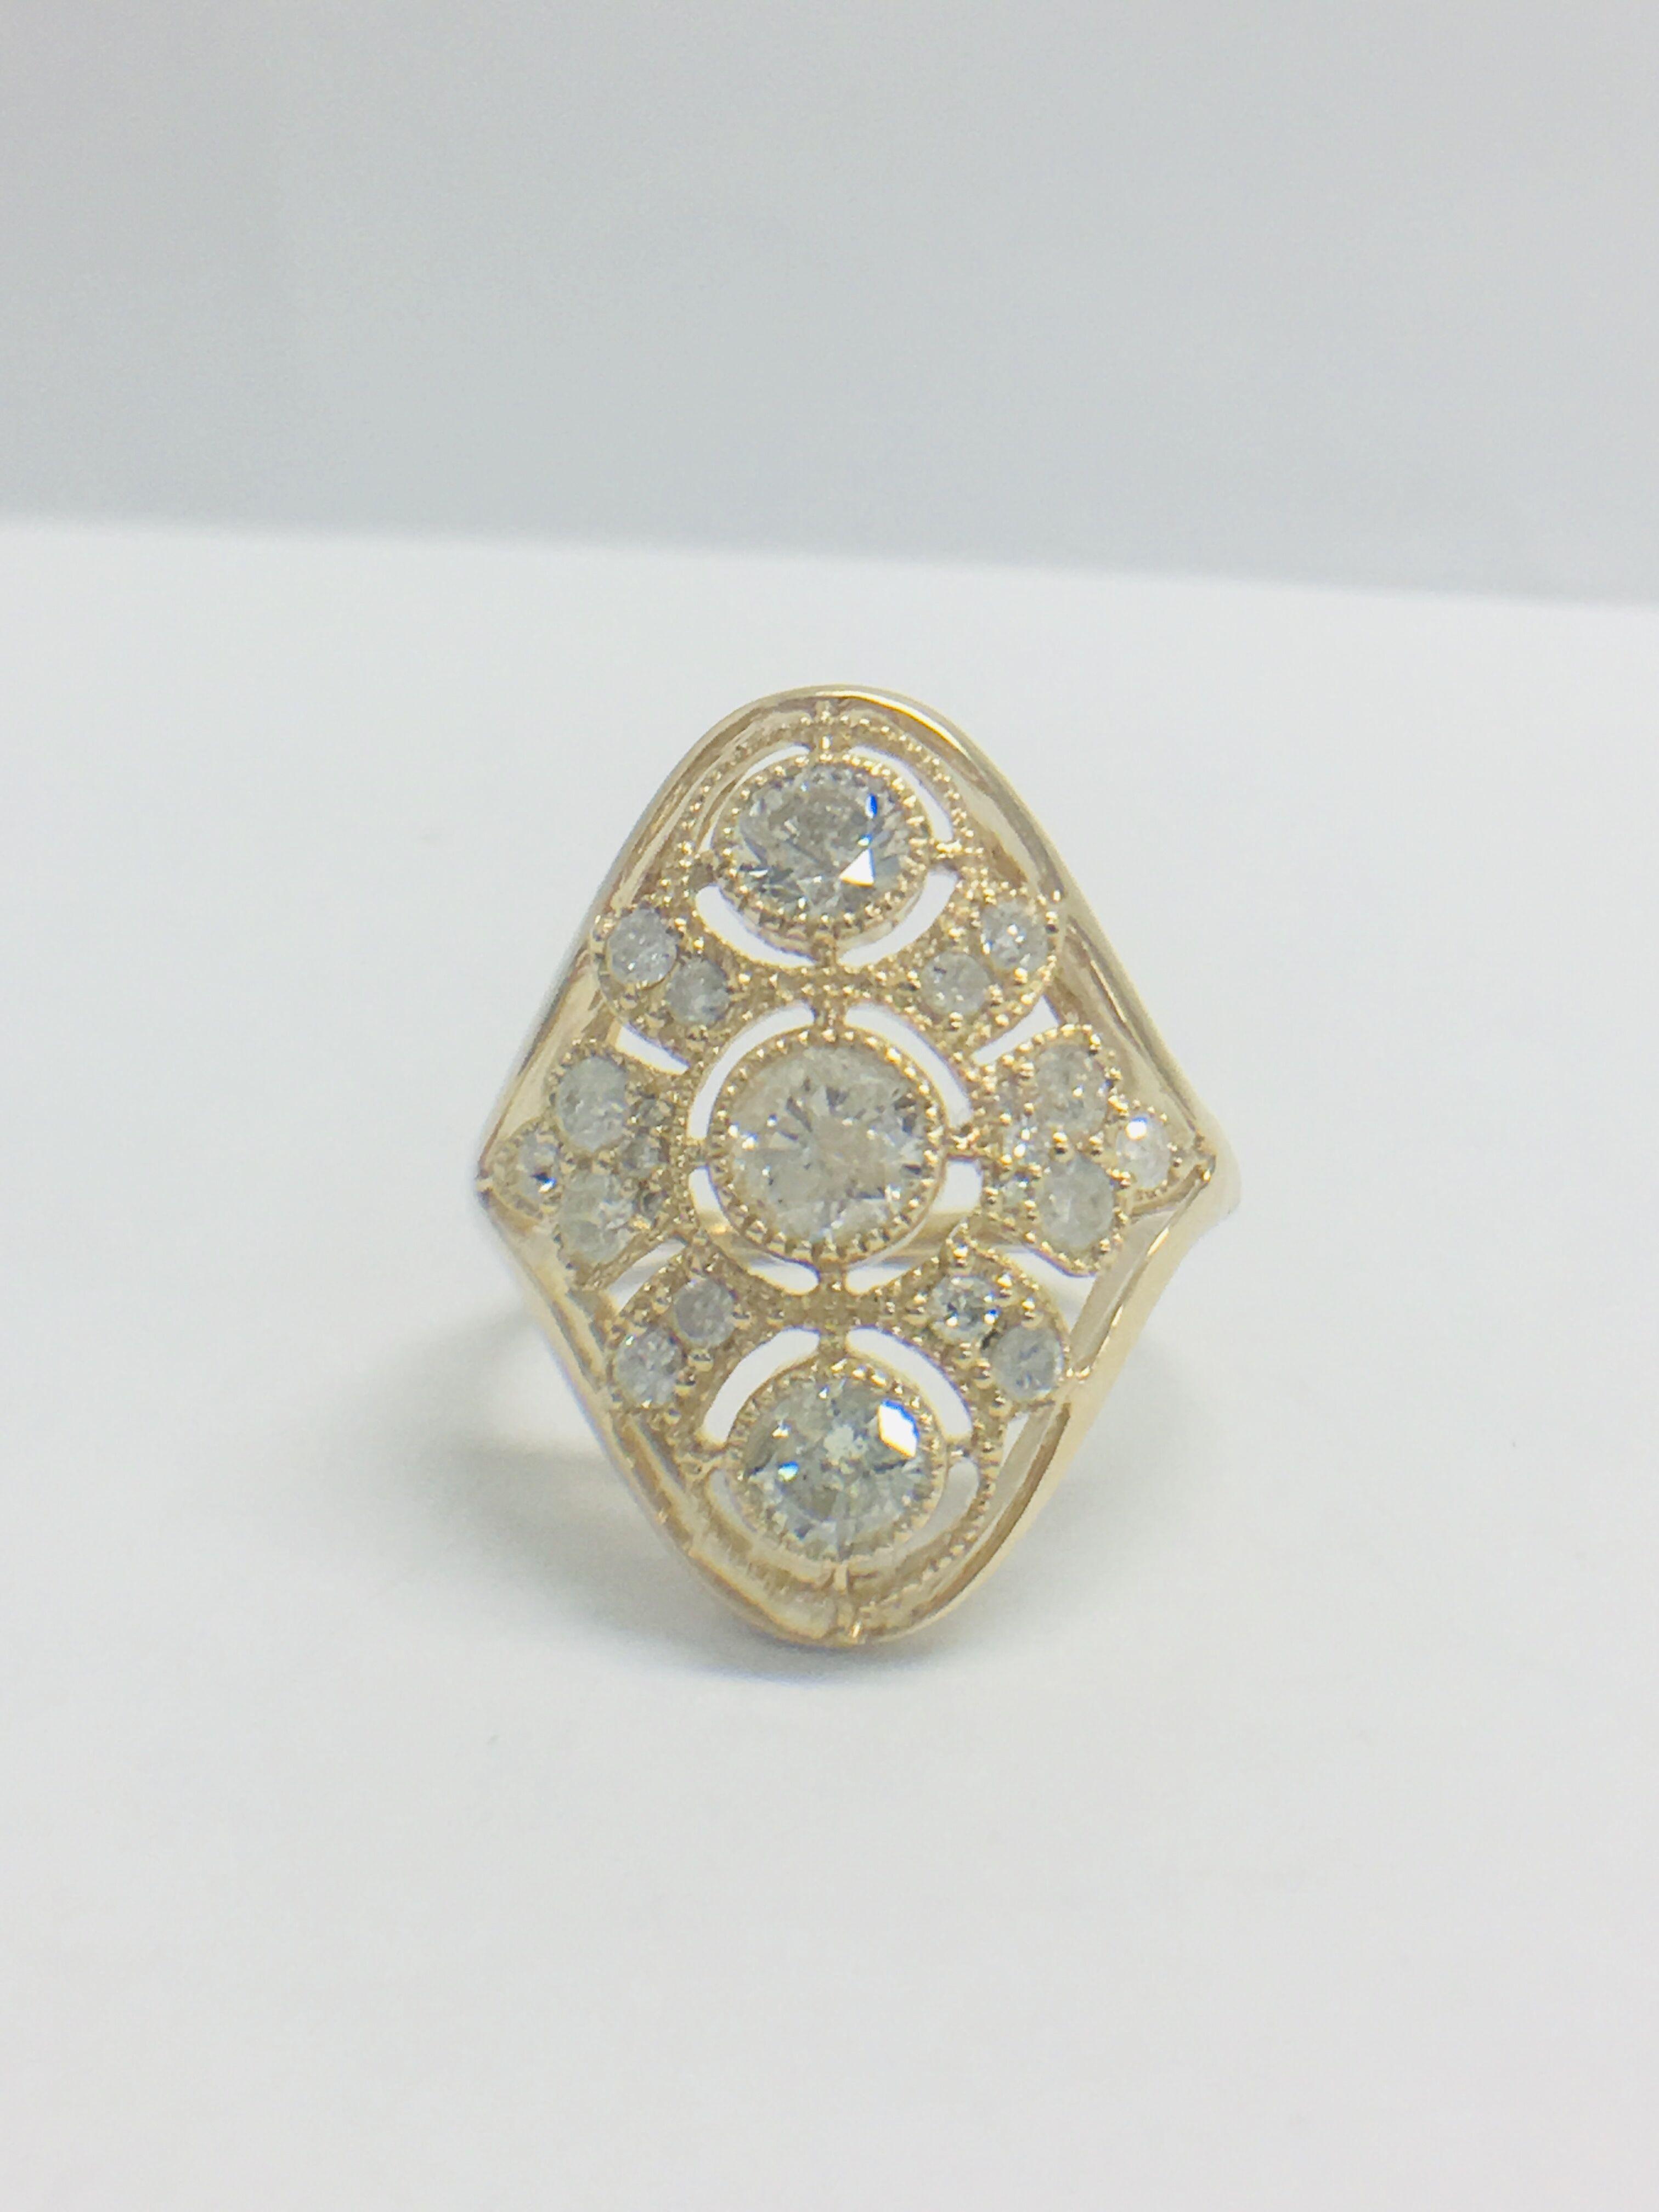 Lot 26 - 14ct Yellow Gold Diamond Ring.